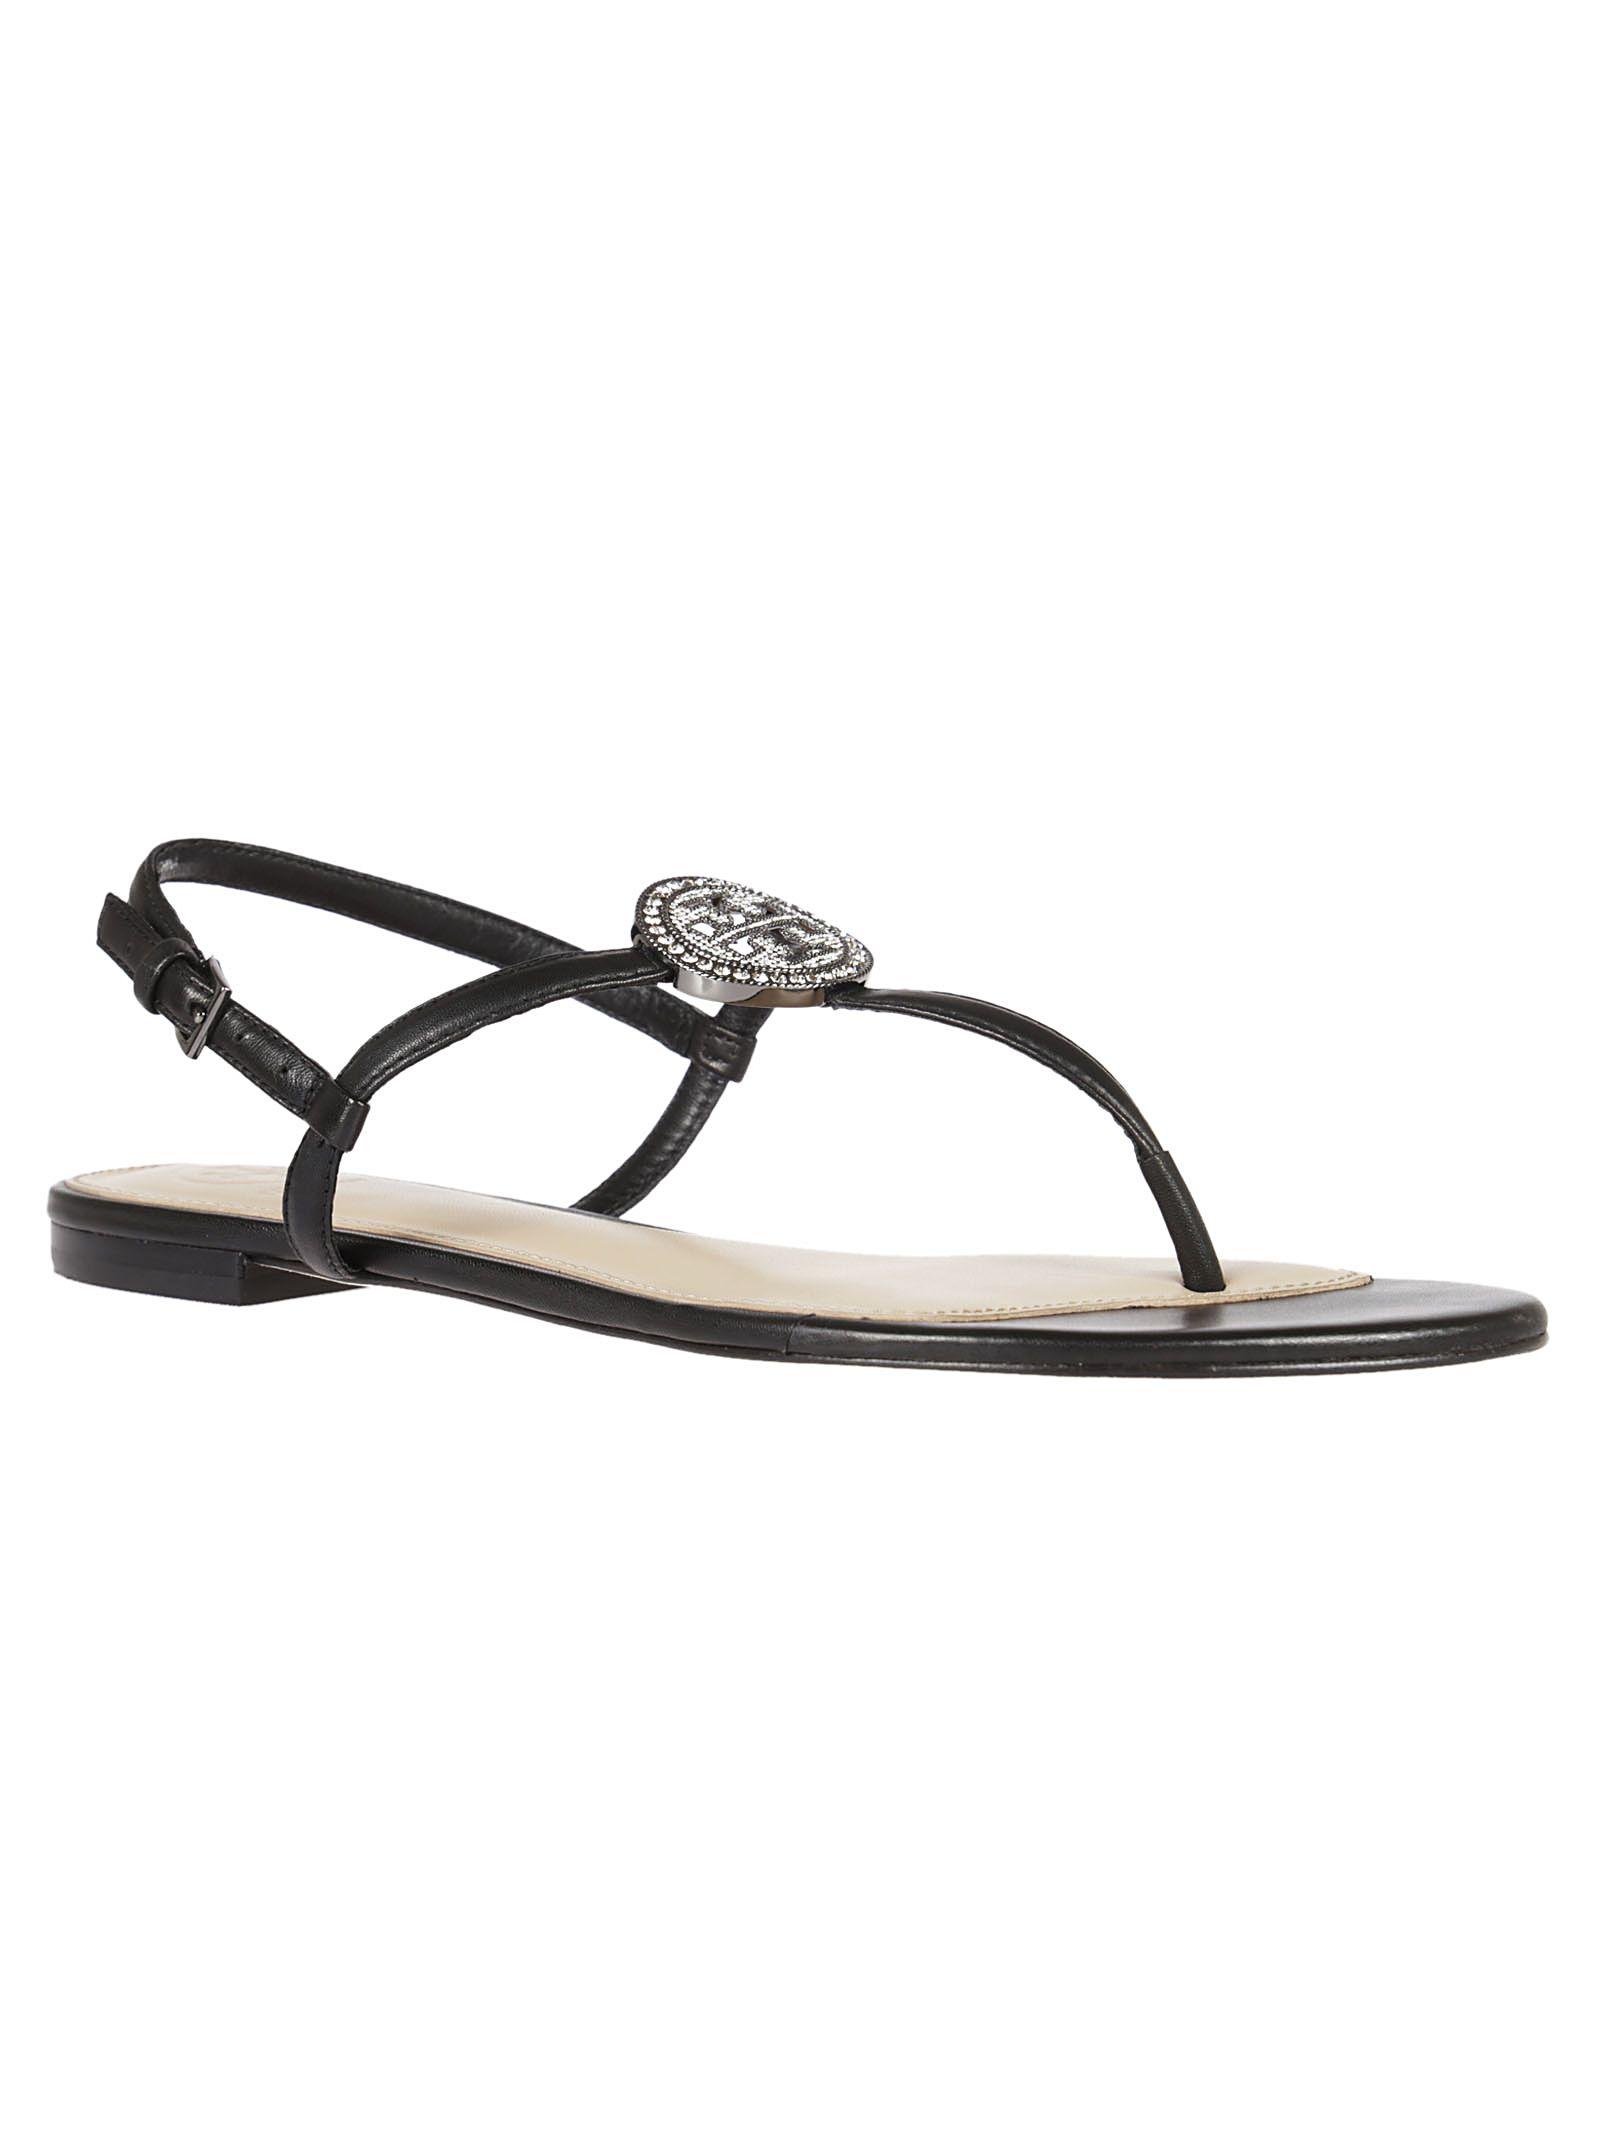 Tory Burch Liana flat sandals - Nero Aclaramiento Más Barata Muchos Colores PdqupBUU